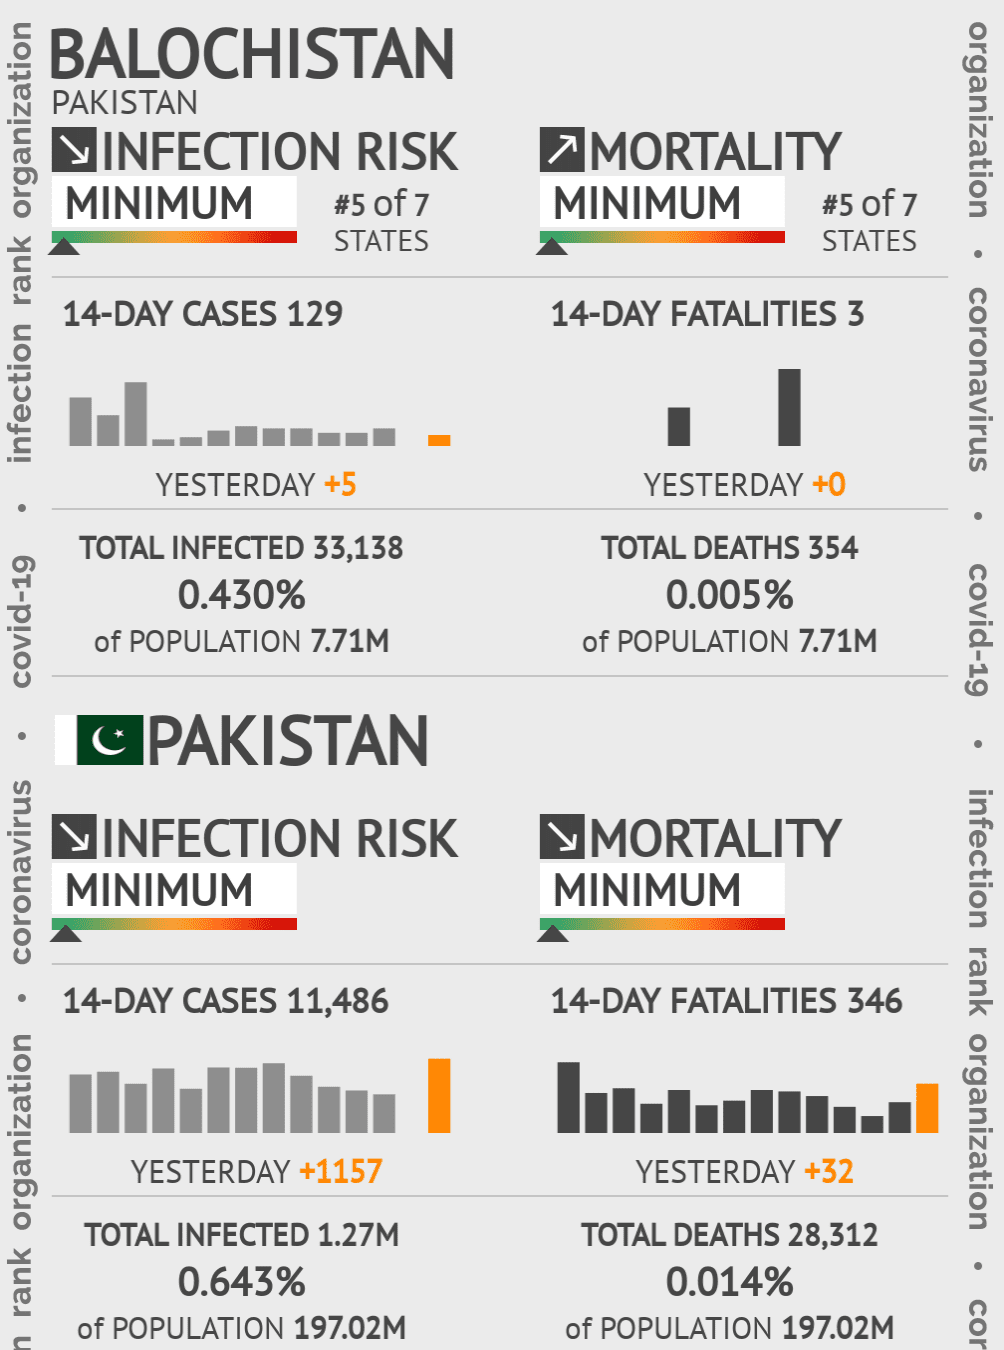 Balochistan Coronavirus Covid-19 Risk of Infection on February 22, 2021